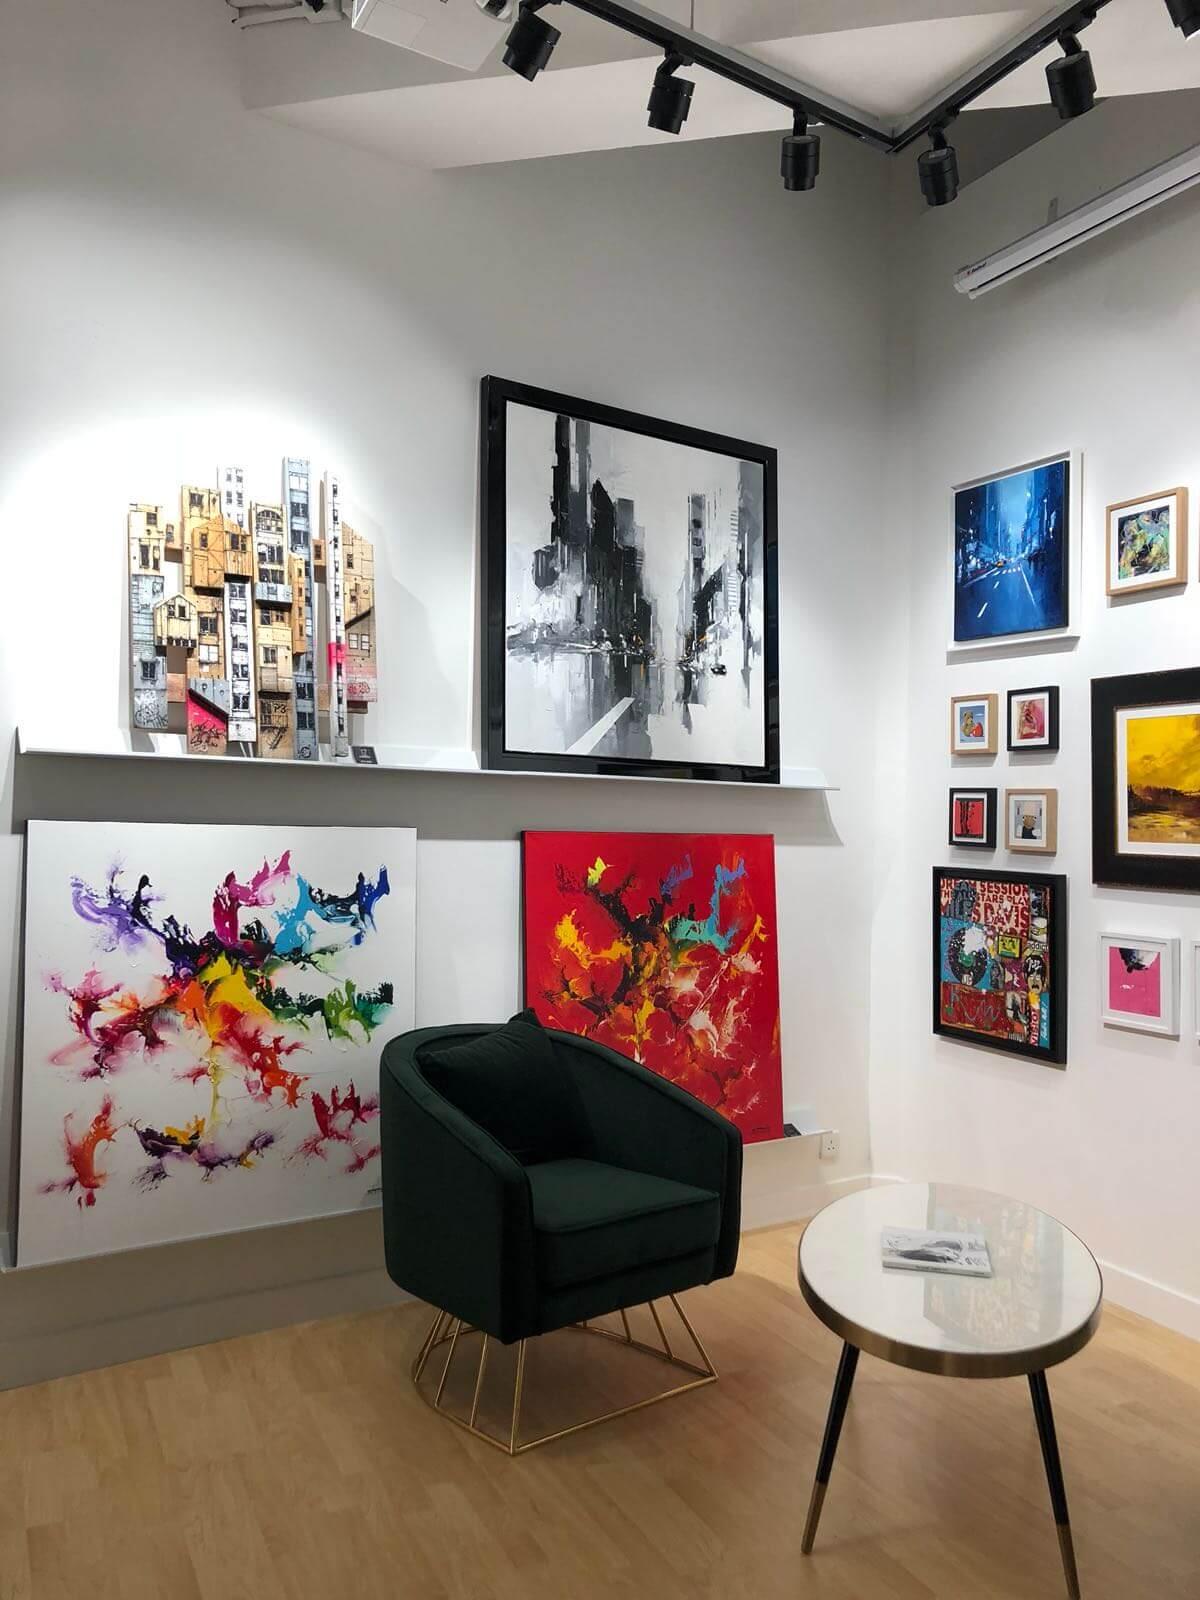 buy interior art in an artist's square art gallery